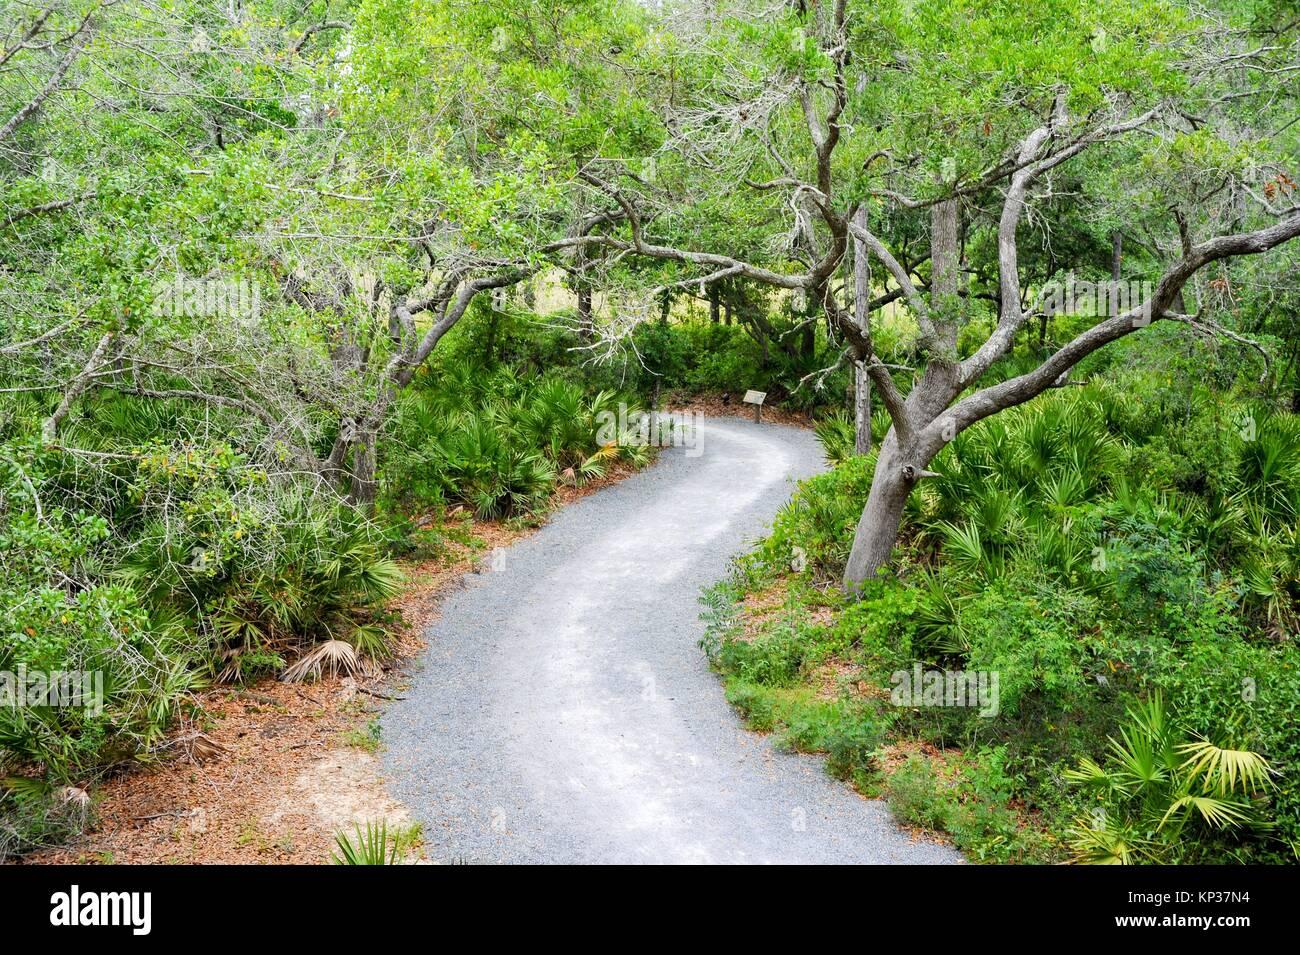 Apalachicola Natural Estaurine Research Reserve Franklin County Florida. - Stock Image